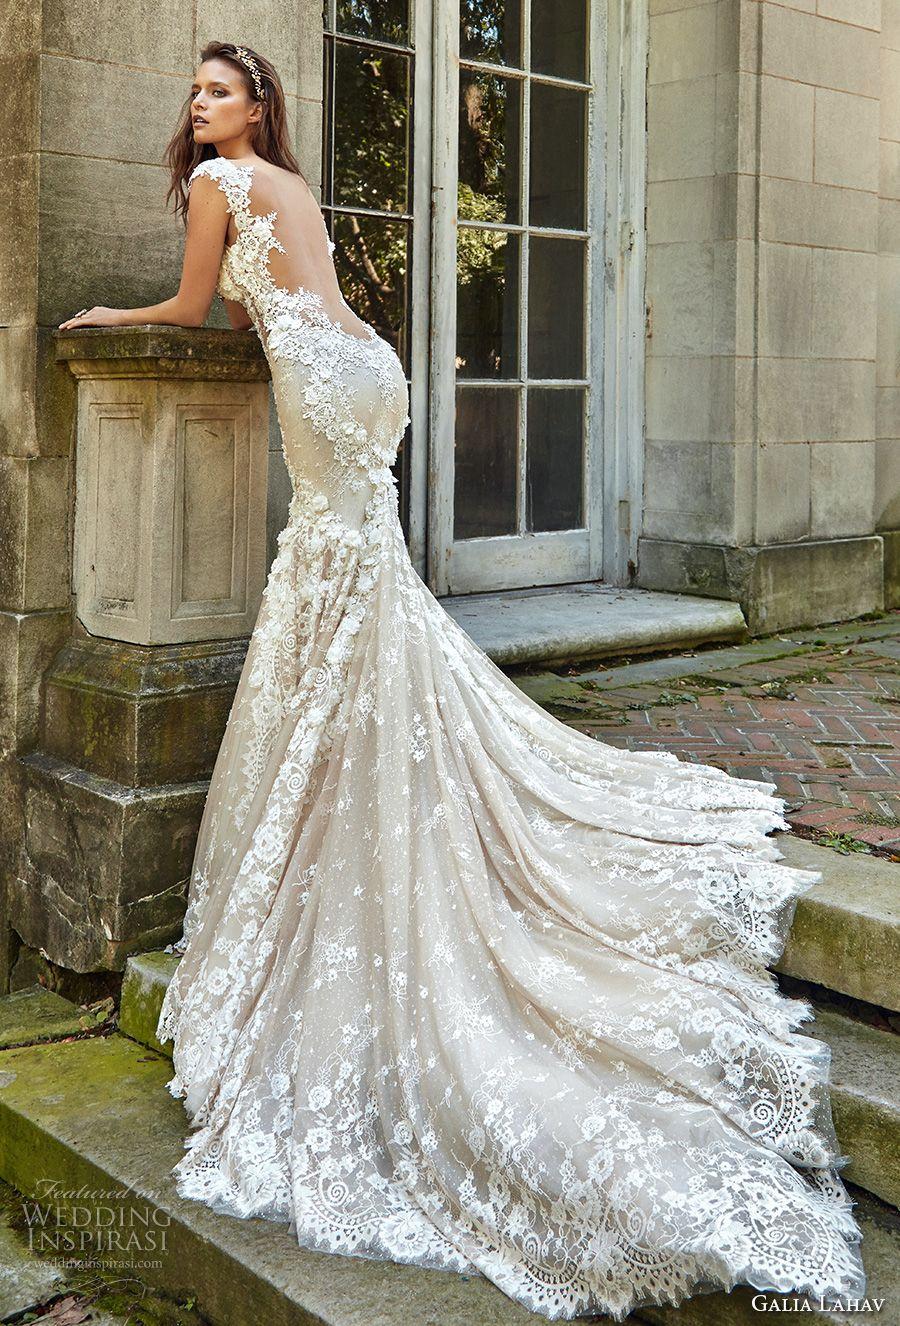 Beautiful Bridal Dreams are Made of These… — Galia Lahav Fall 2017 ...